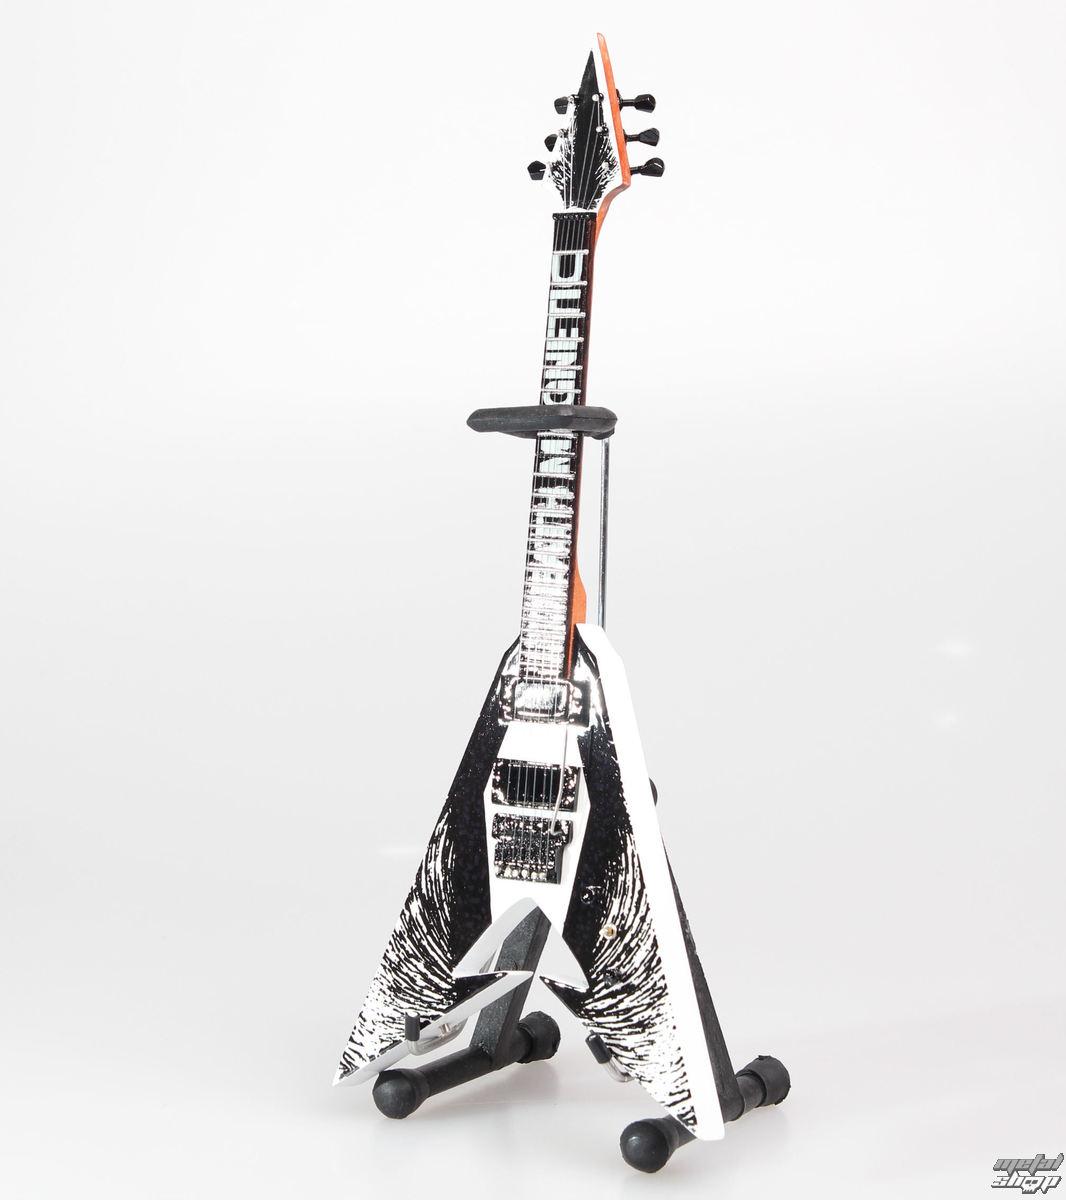 gitara Metallica - Kirk Hammett - Magnetic - MINI GUITAR USA - MTDM